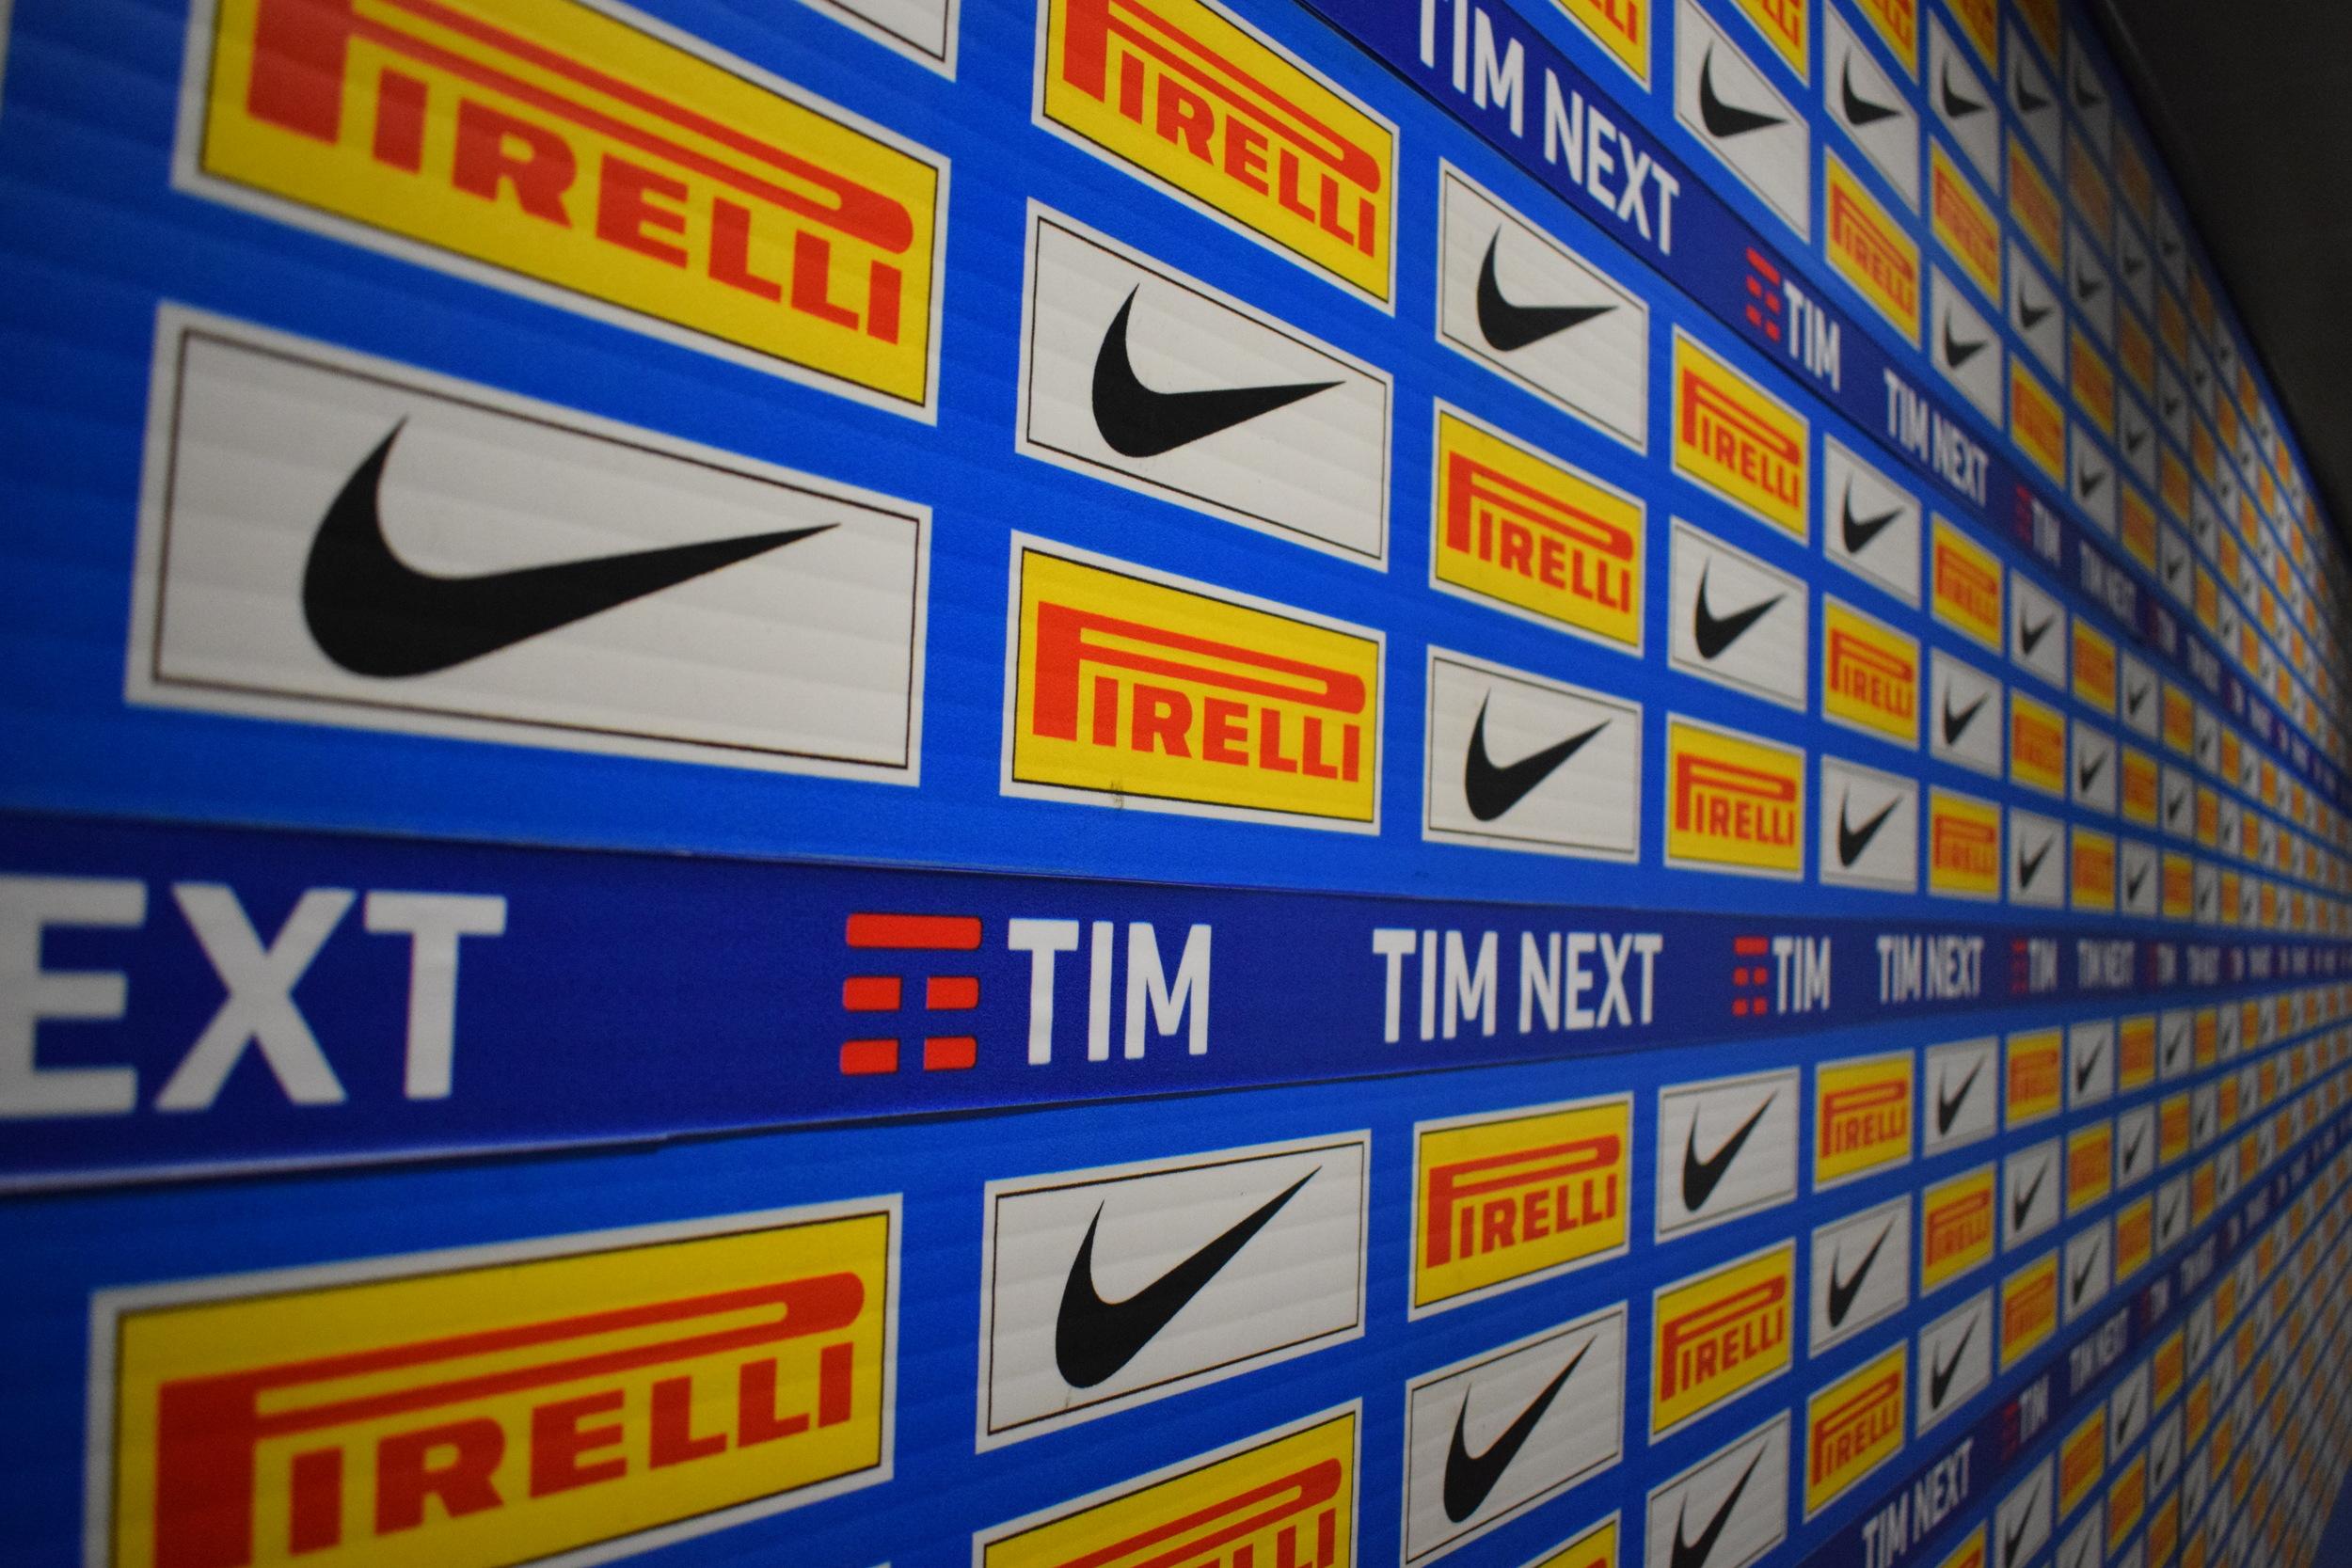 The San Siro mixed zone in Internazionale colours.